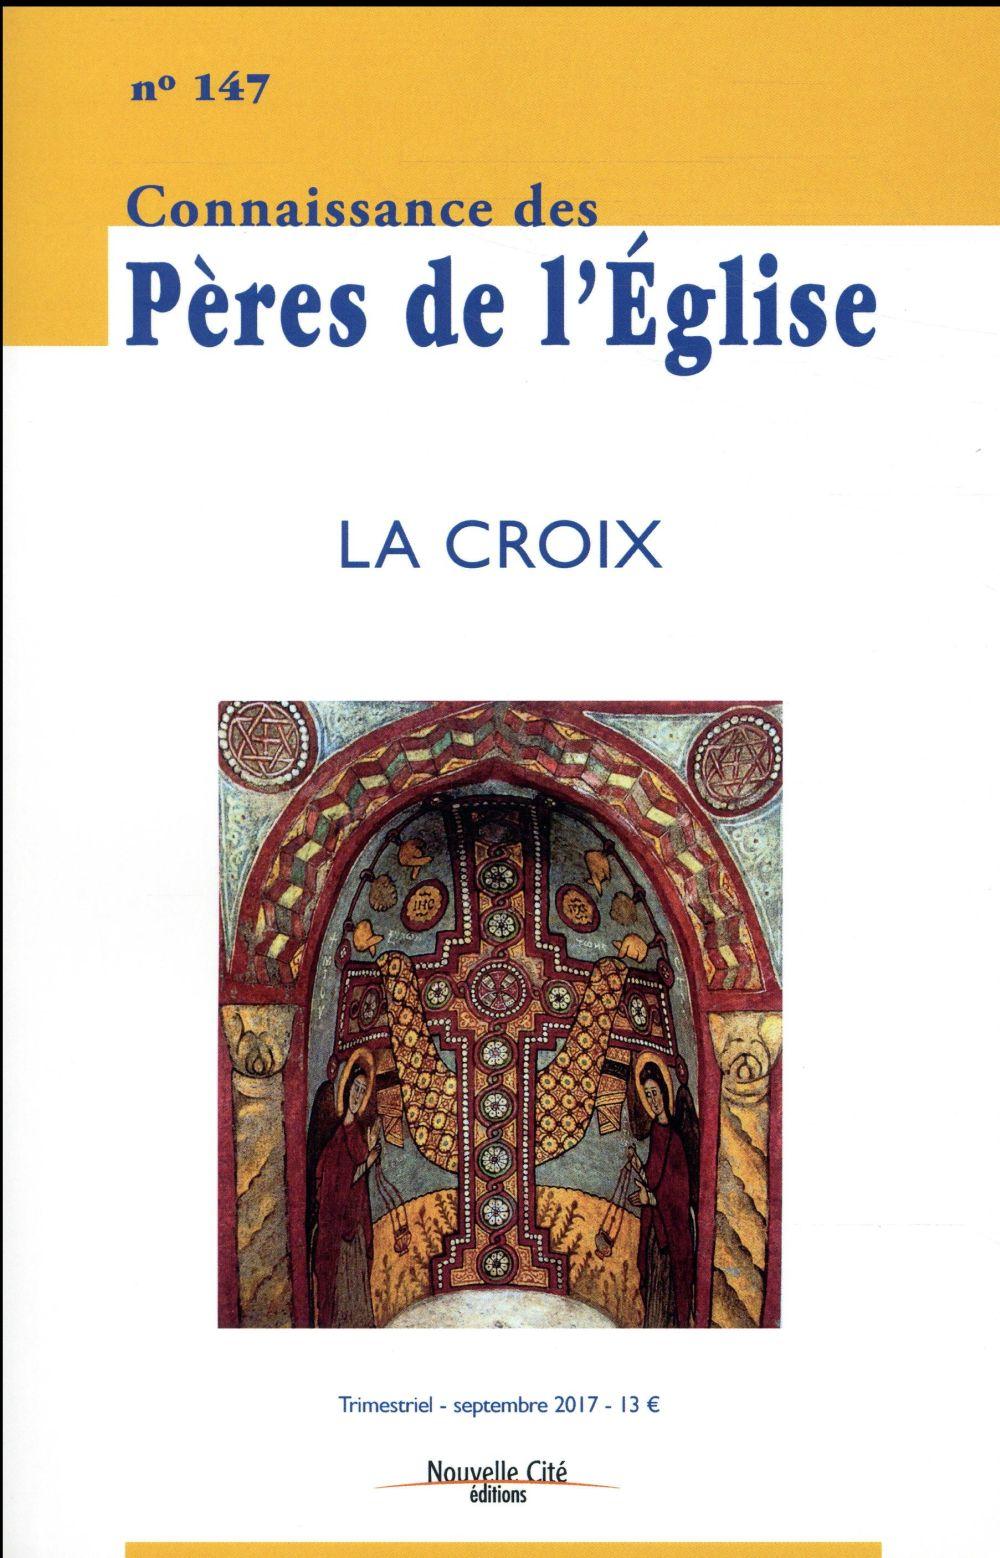 CPE 147 LA CROIX